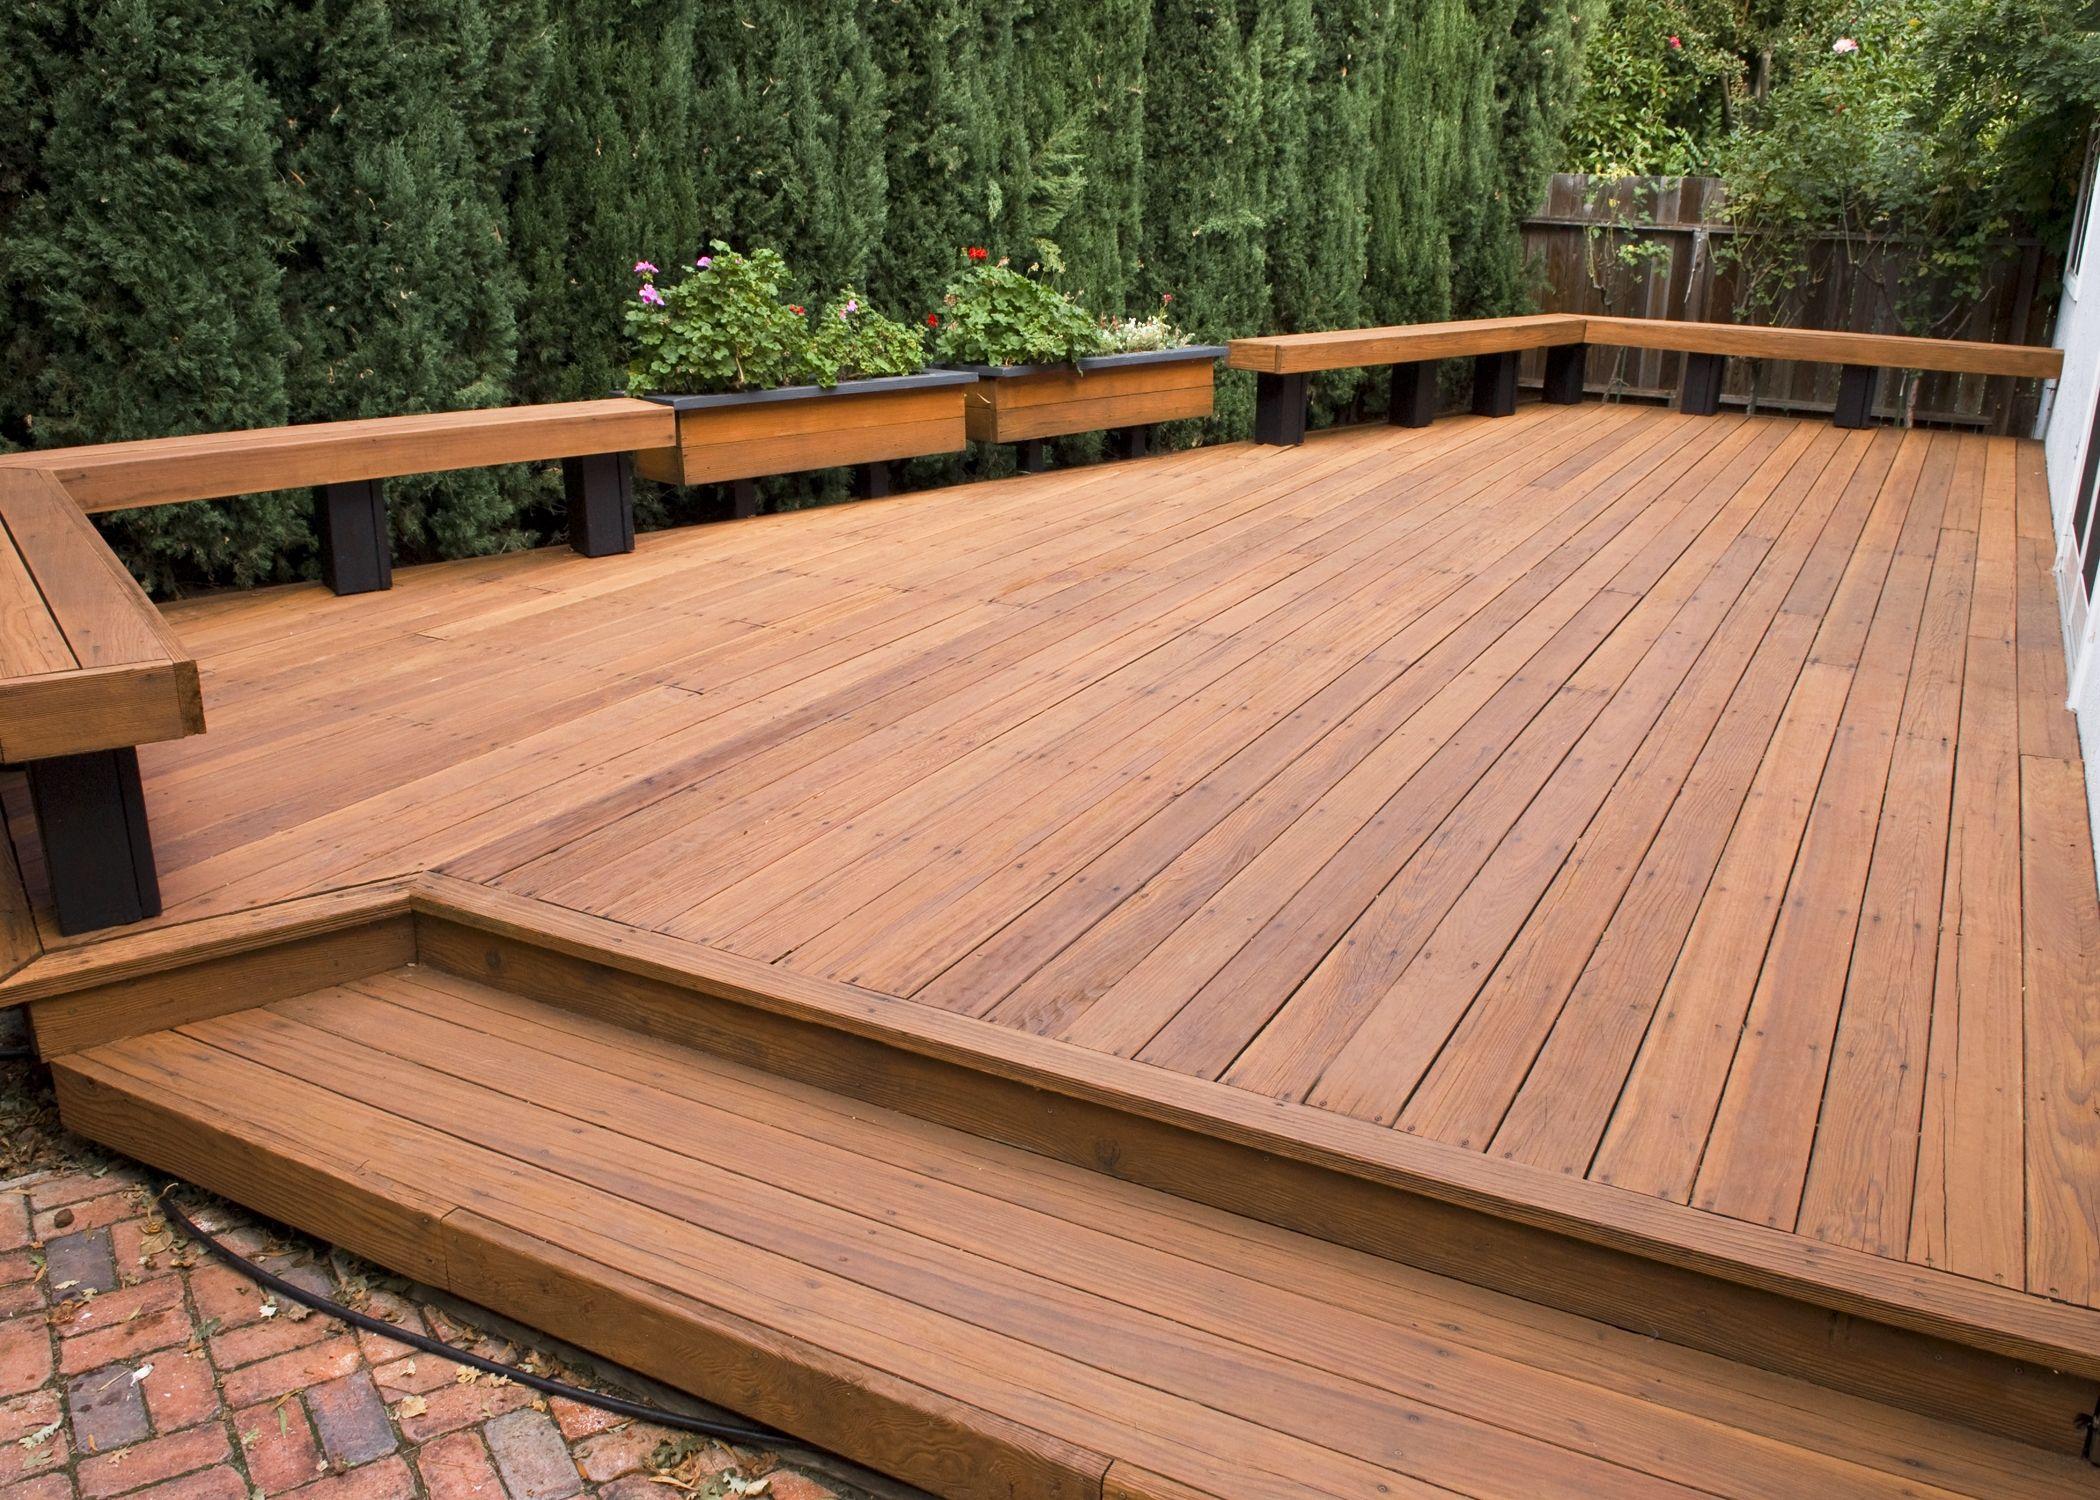 Deck sanding before staining deck deck alternatives